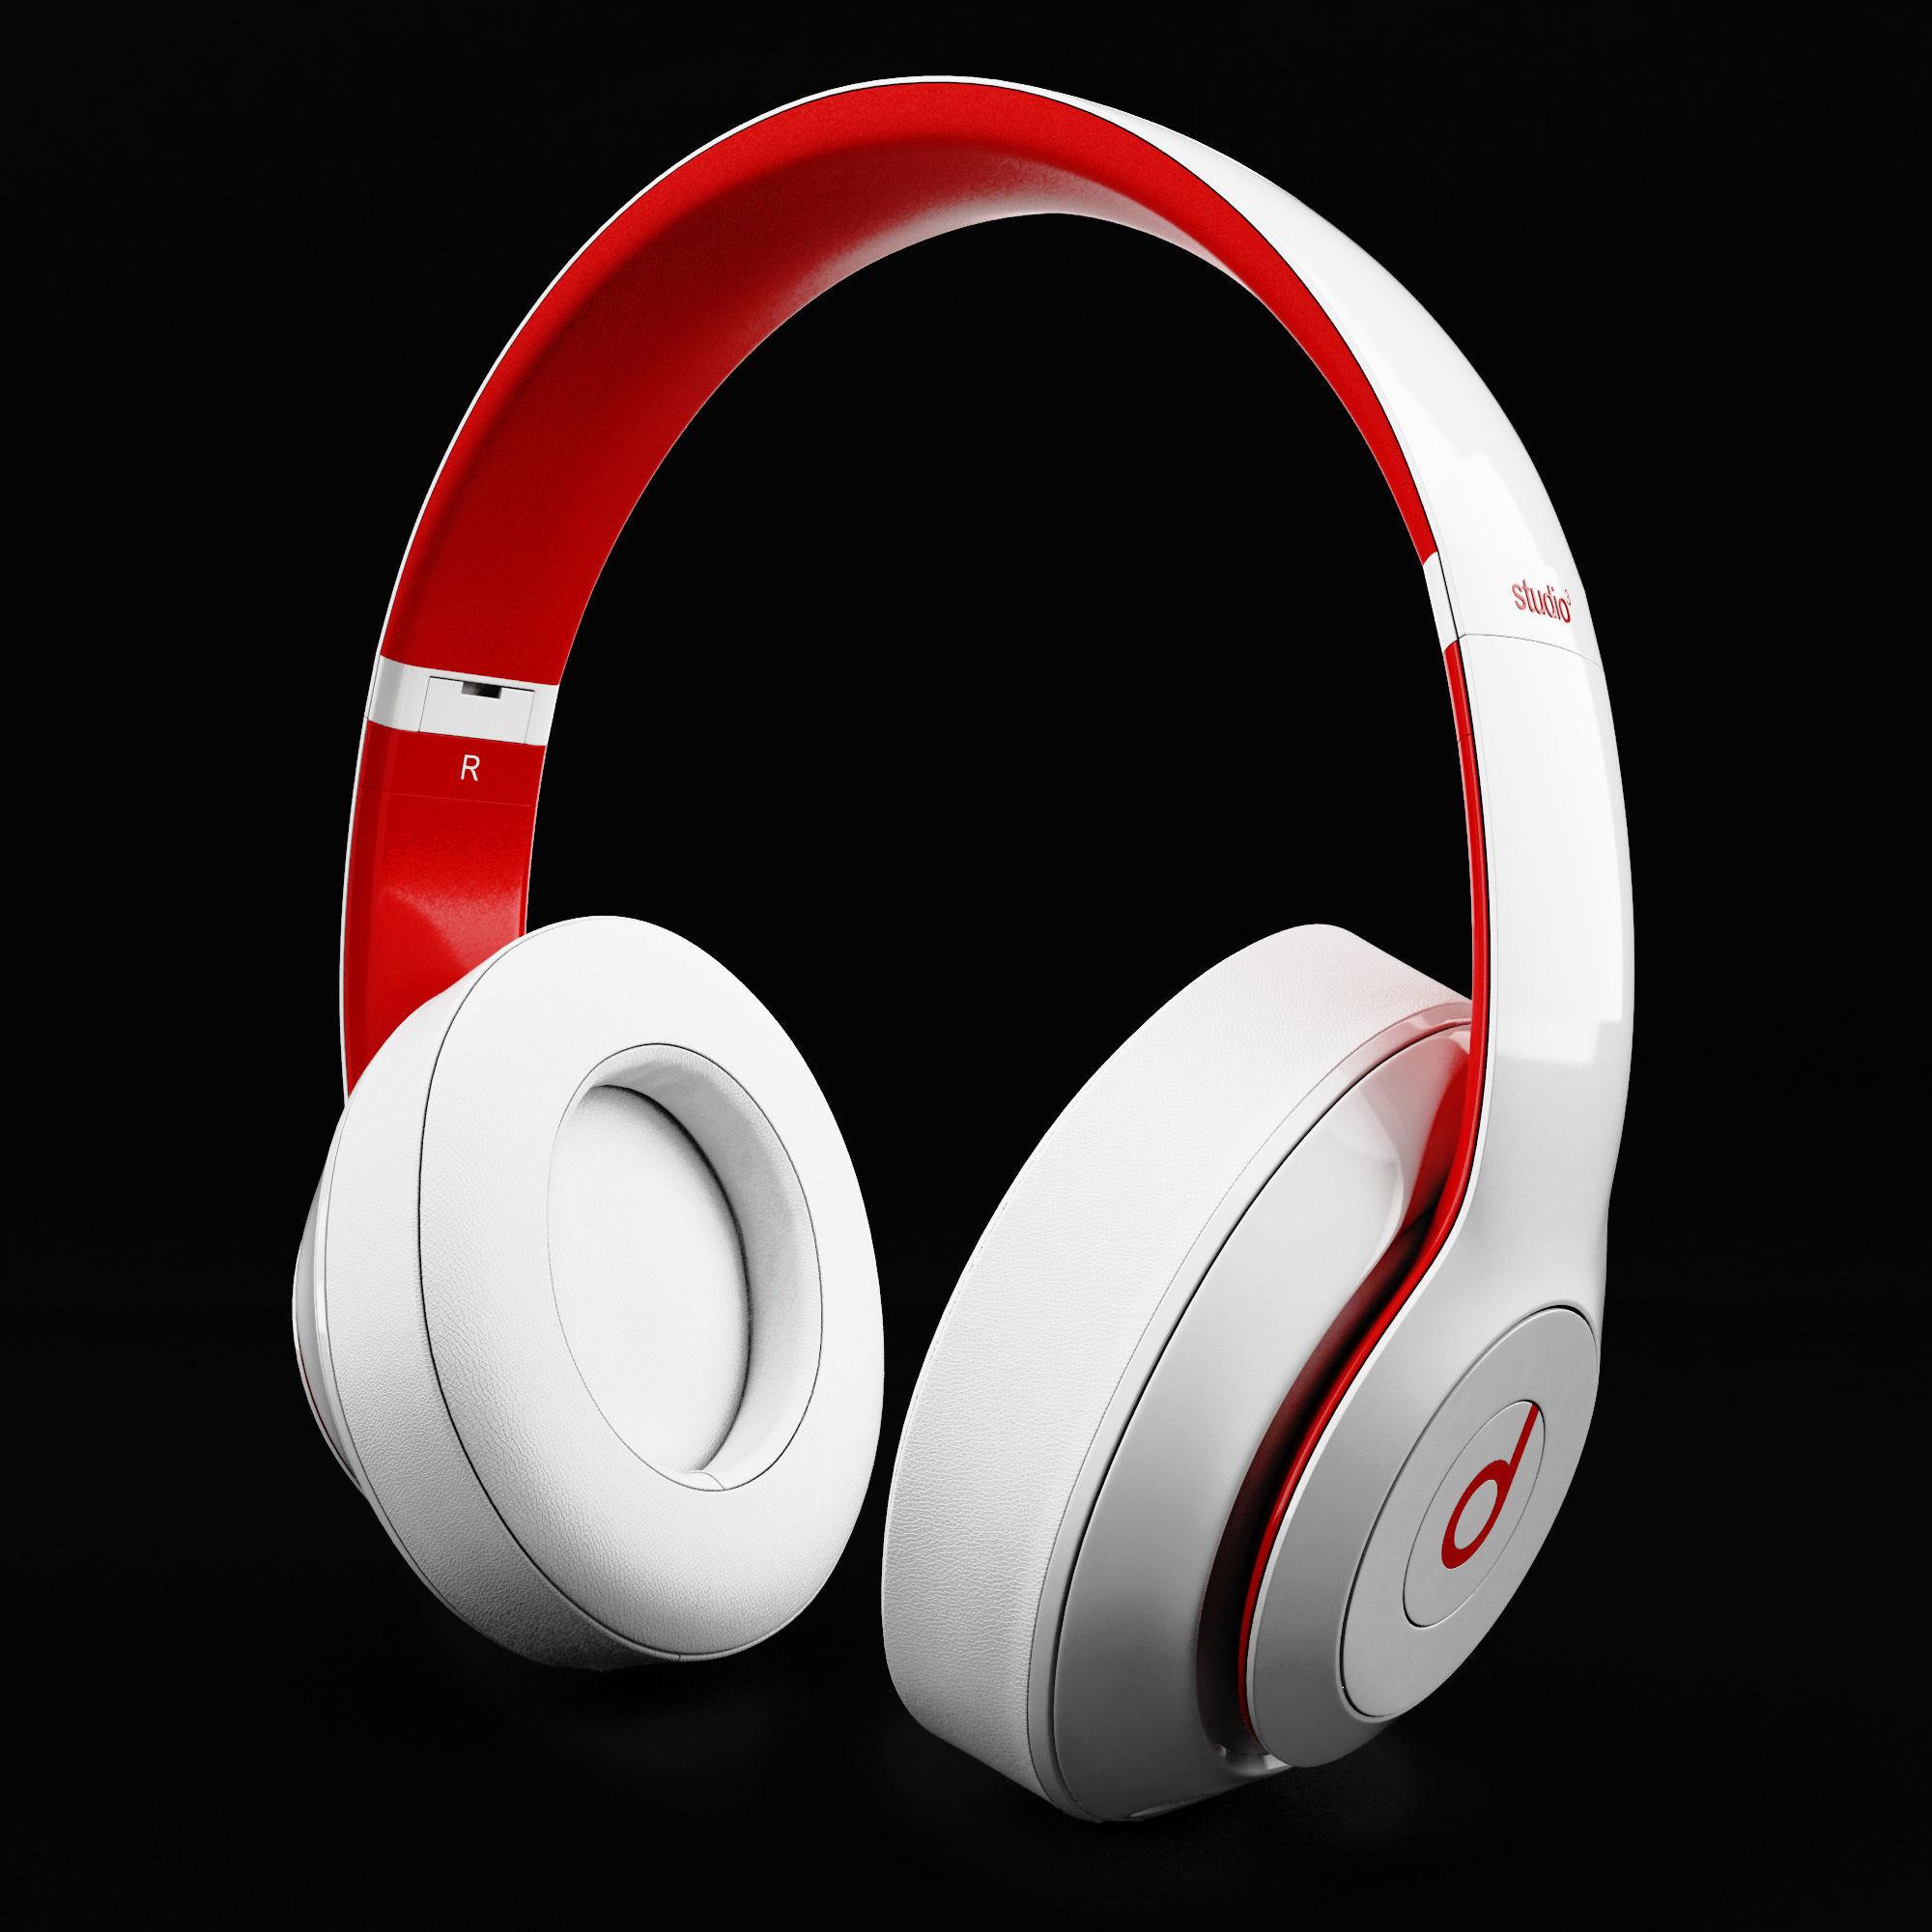 044fbc26559 White And Red Headphones - Image Headphone Mvsbc.Org